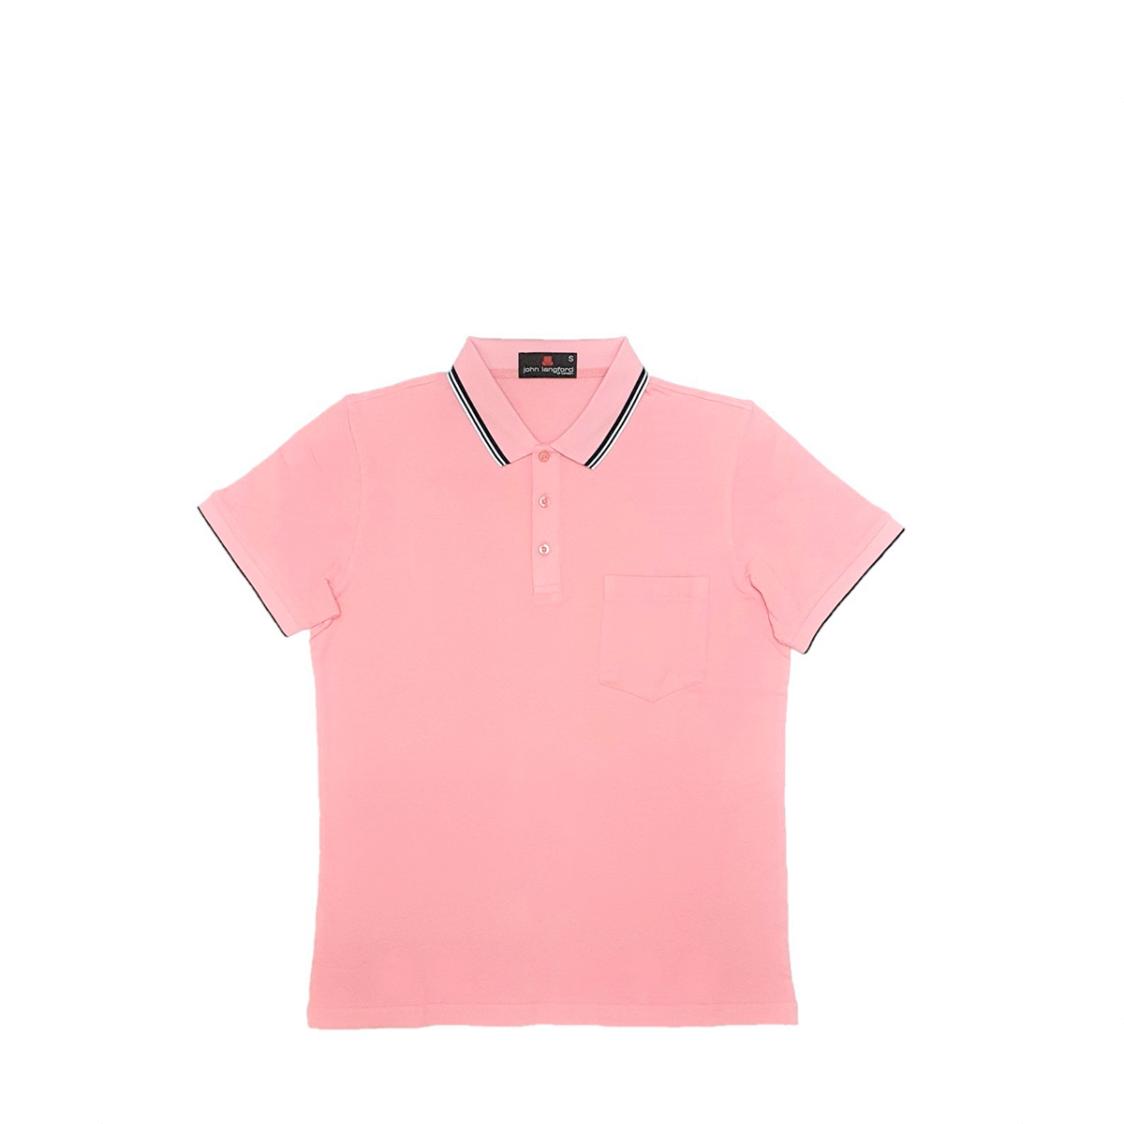 John Langford Pique Polo T-Shirt with Pocket Pink